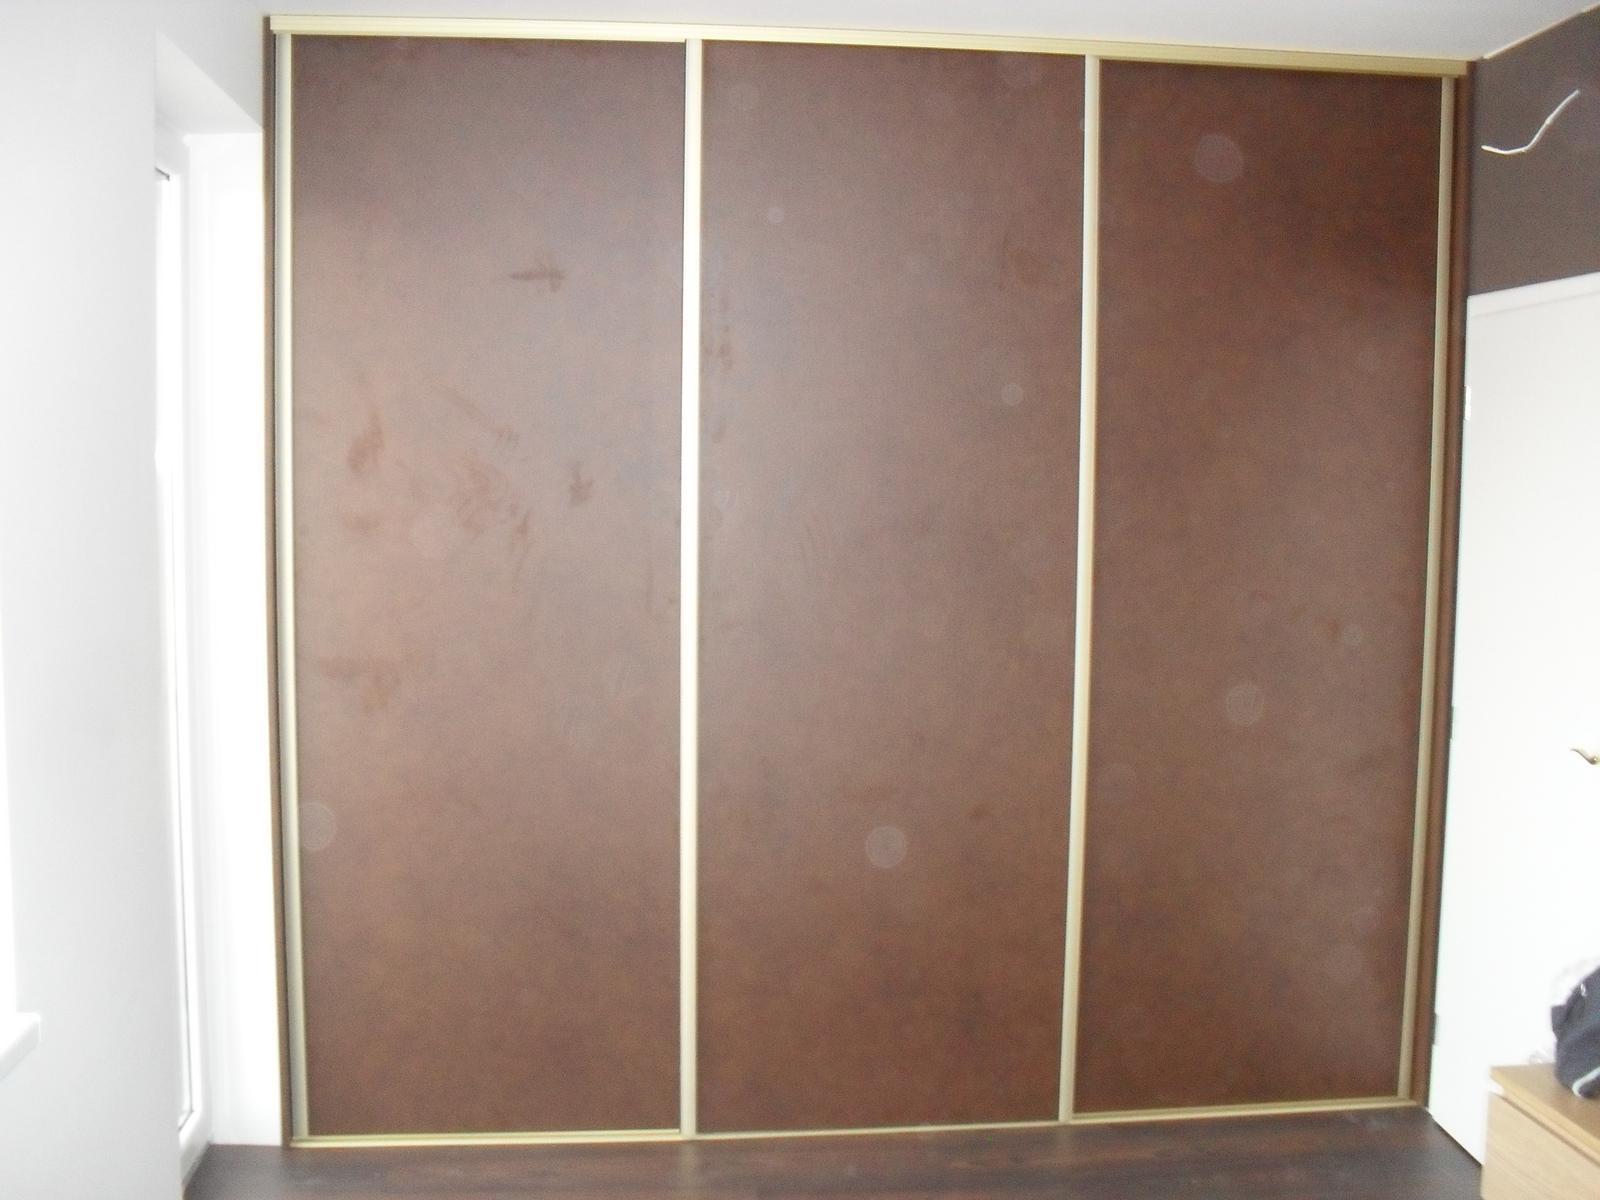 Vstavané skrine Martin Benko Bošany - Obrázok č. 53